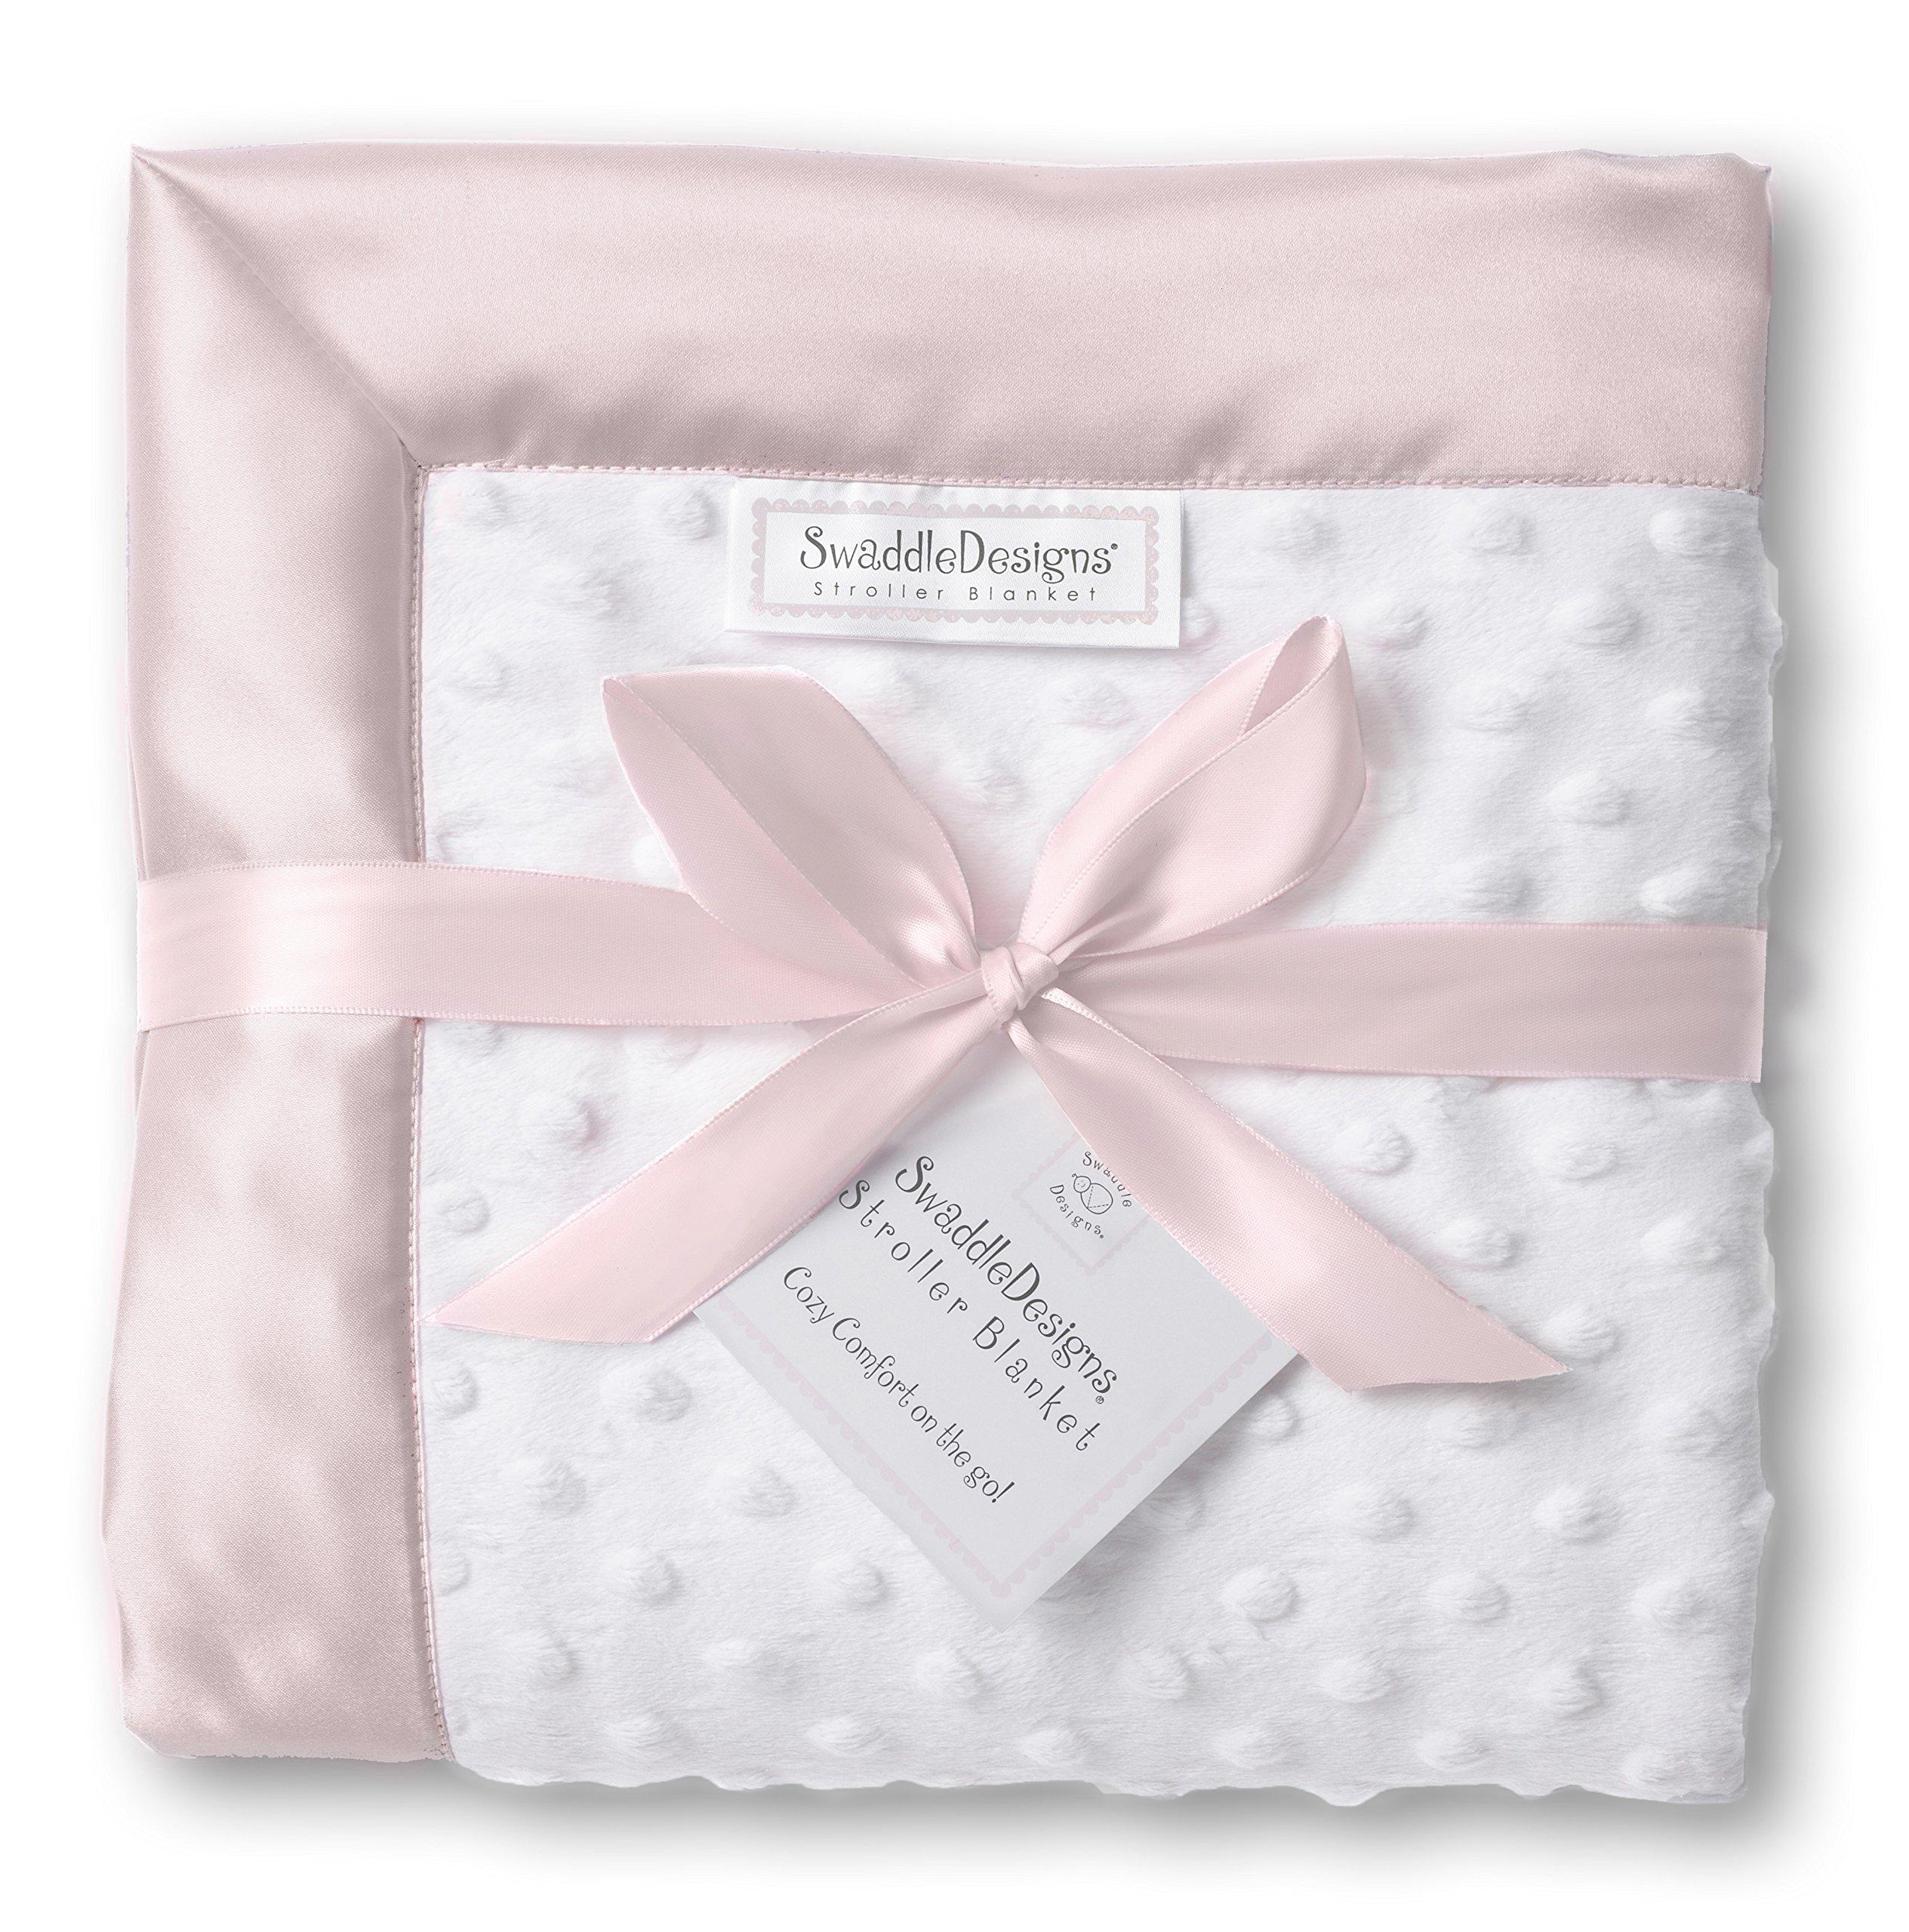 SwaddleDesigns Stroller Blanket, Cozy Microfleece, Plush Dots with Pastel Pink Satin Trim